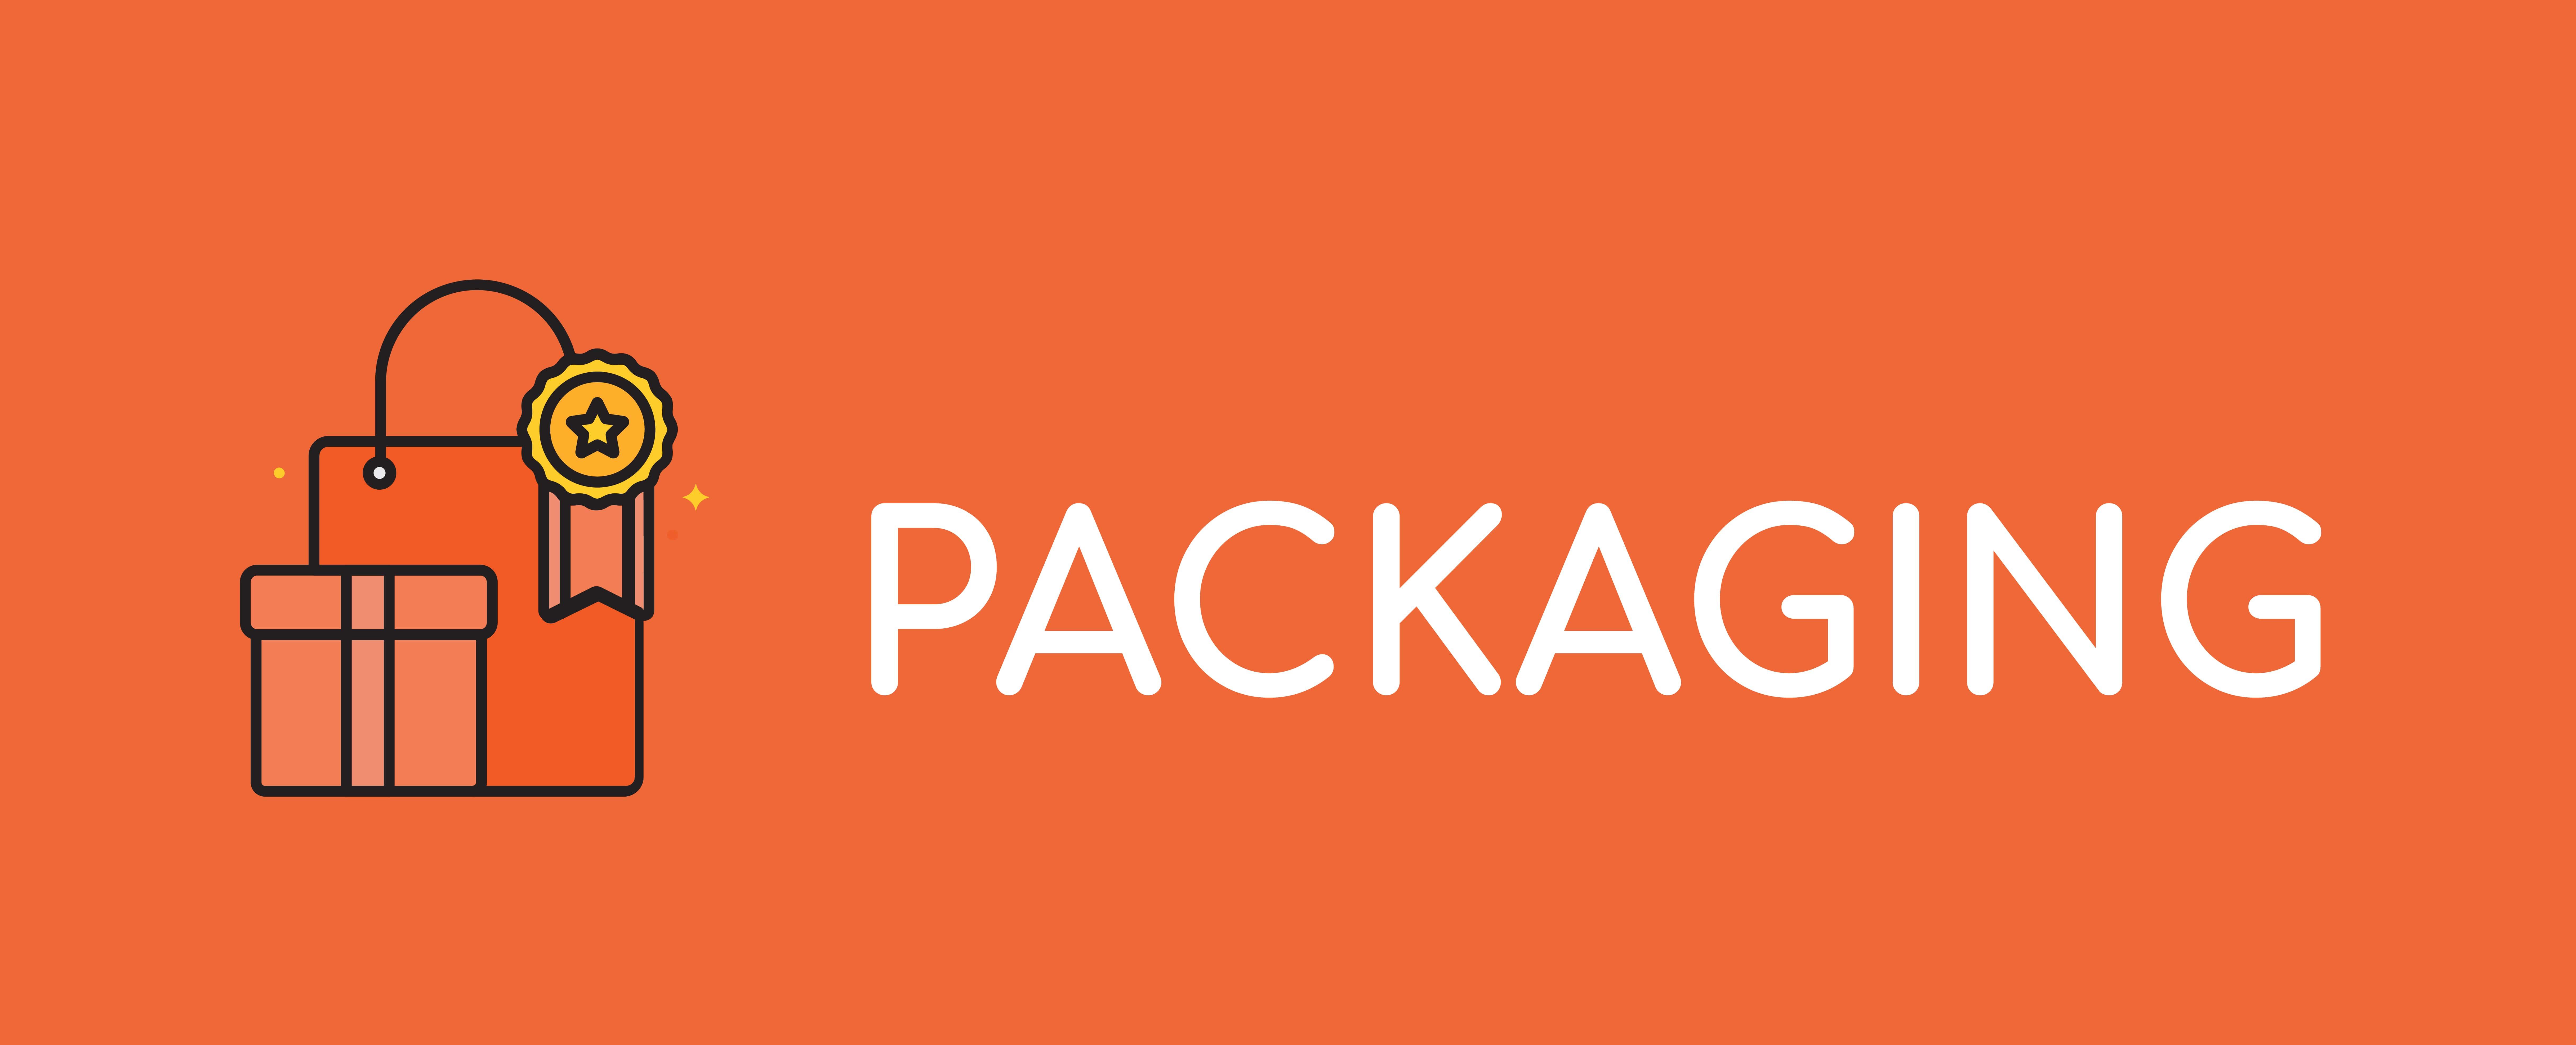 packaging como estrategia de marketing